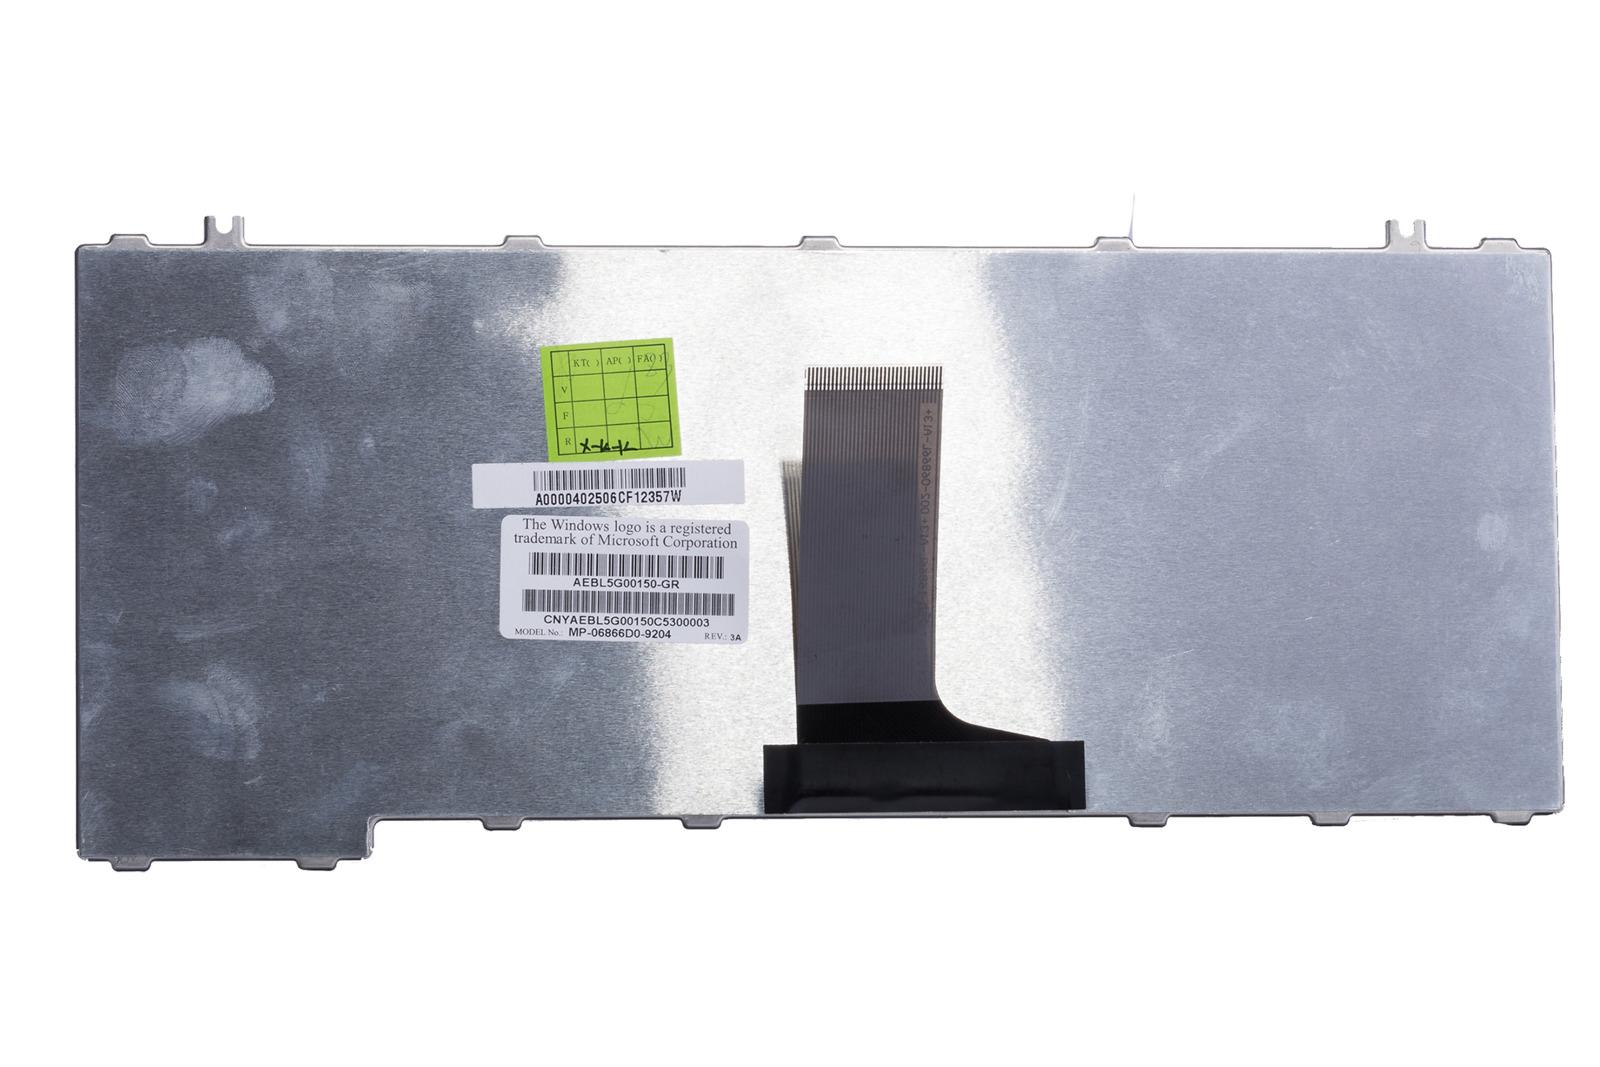 Klawiatura do laptopa Toshiba MP-06866D0-9204 (Niemiecka)